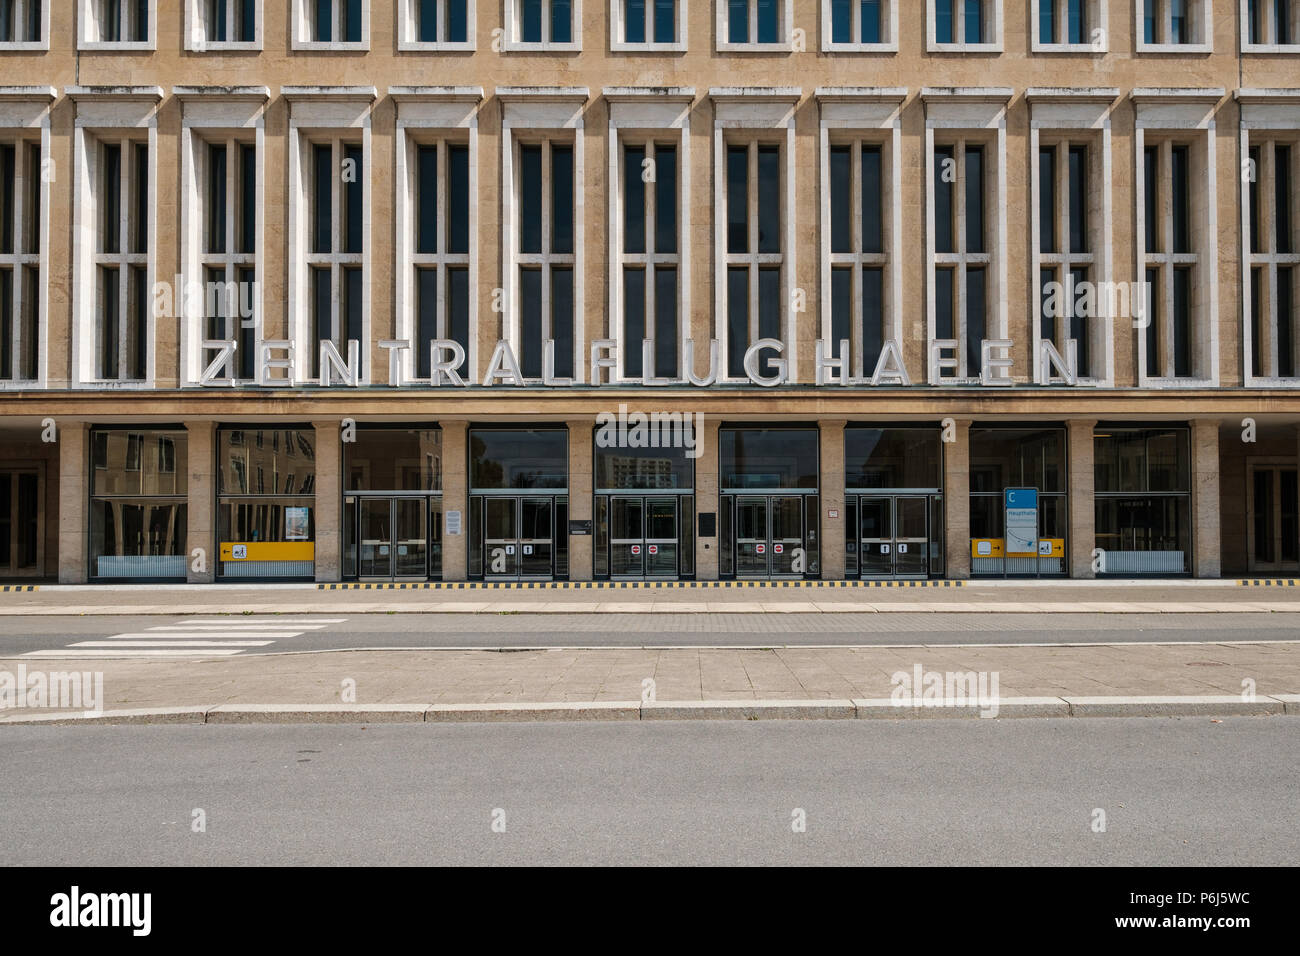 Berlin, Germany - june 2018: The Tempelhof International Airport / former airport building in Berlin, Germany - Stock Image